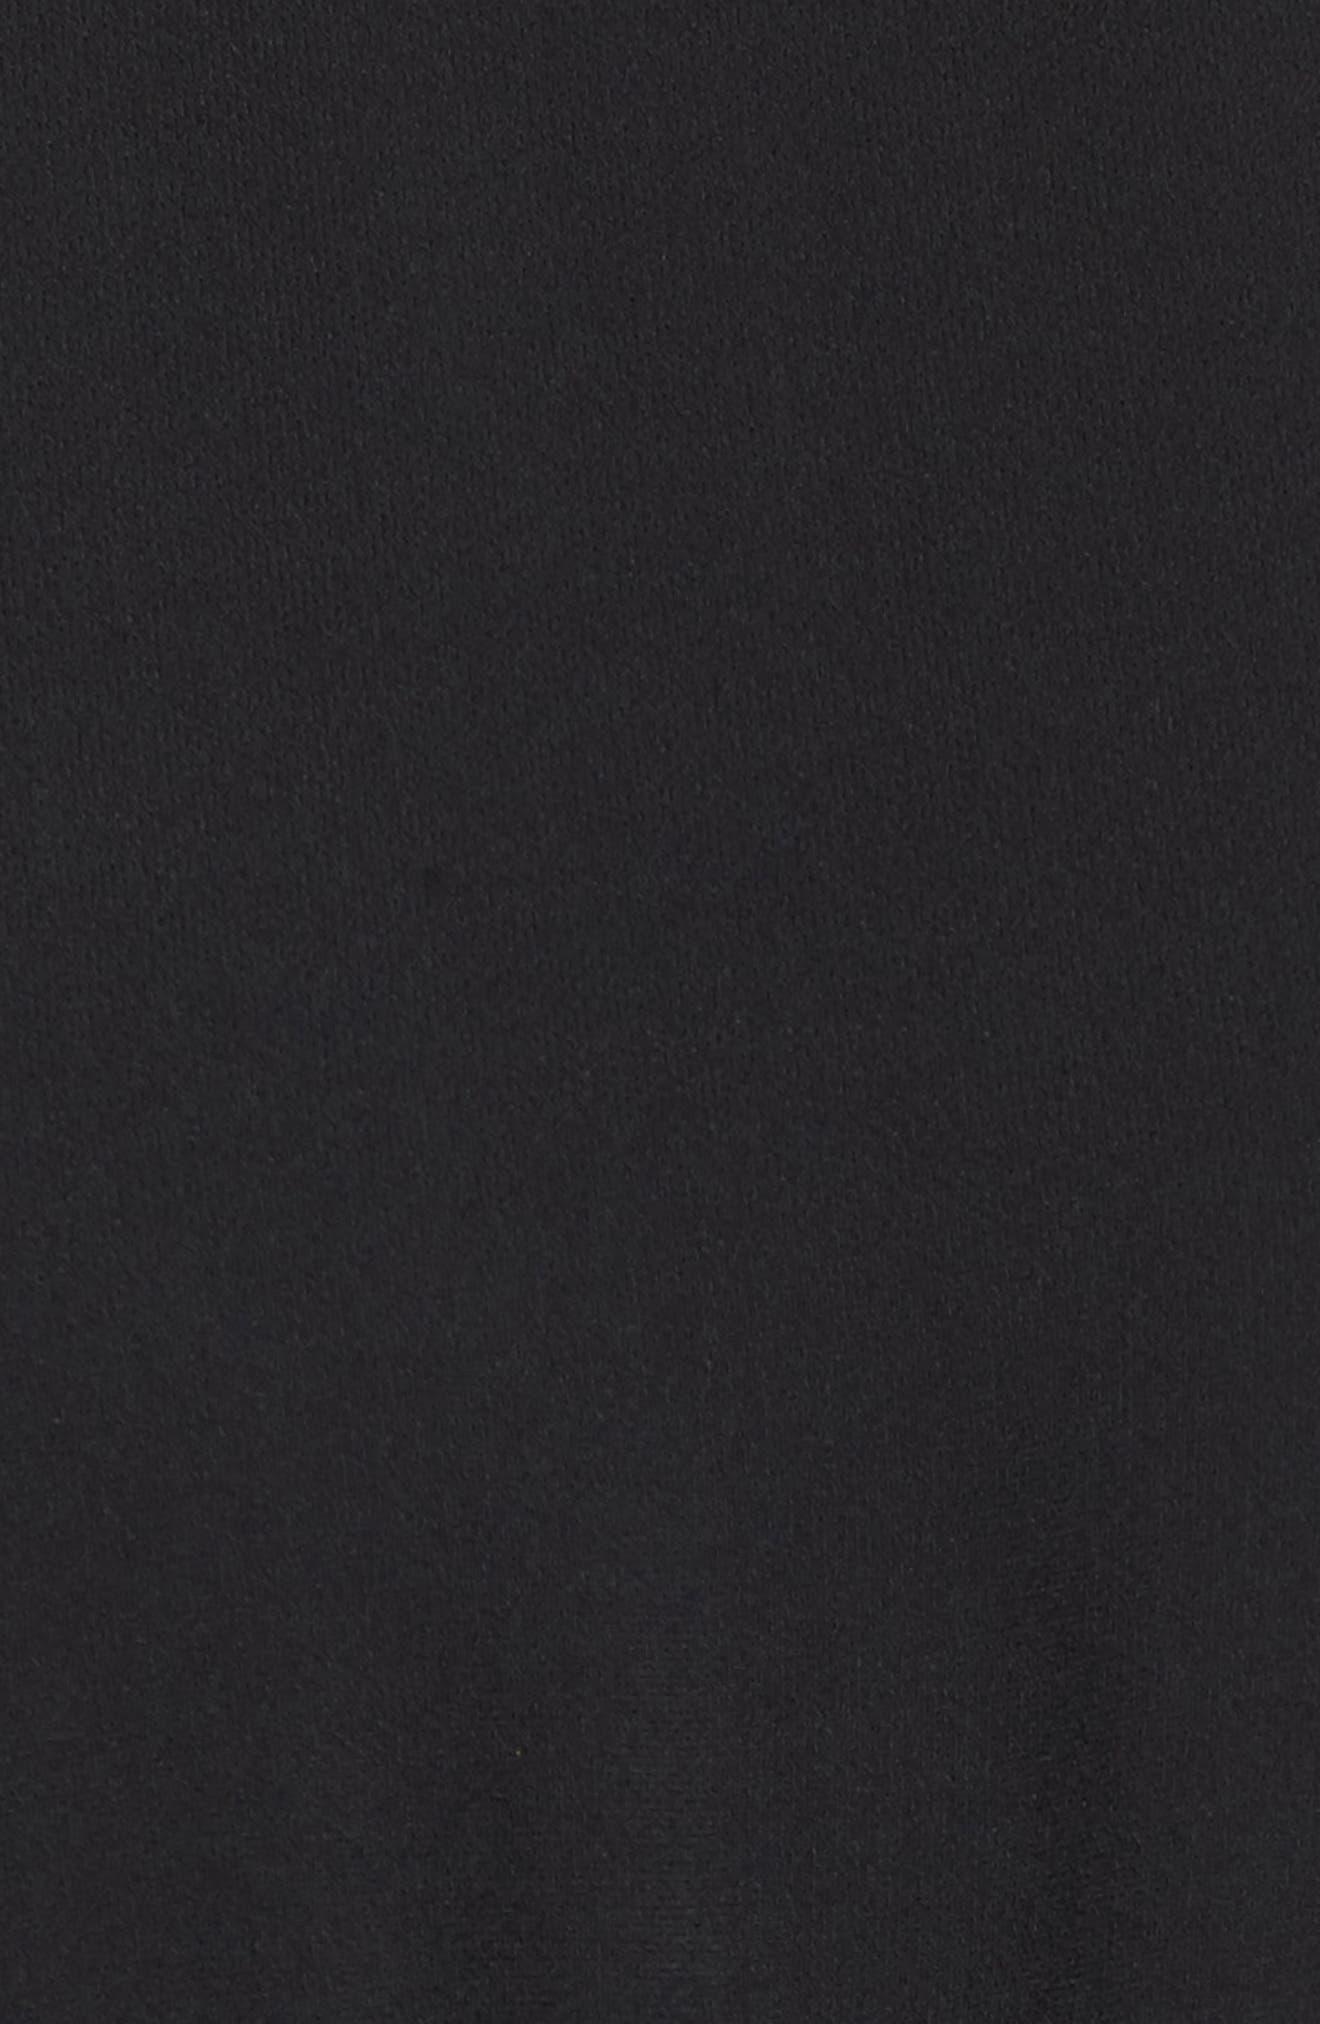 St Germain Ruffle Fit & Flare Dress,                             Alternate thumbnail 9, color,